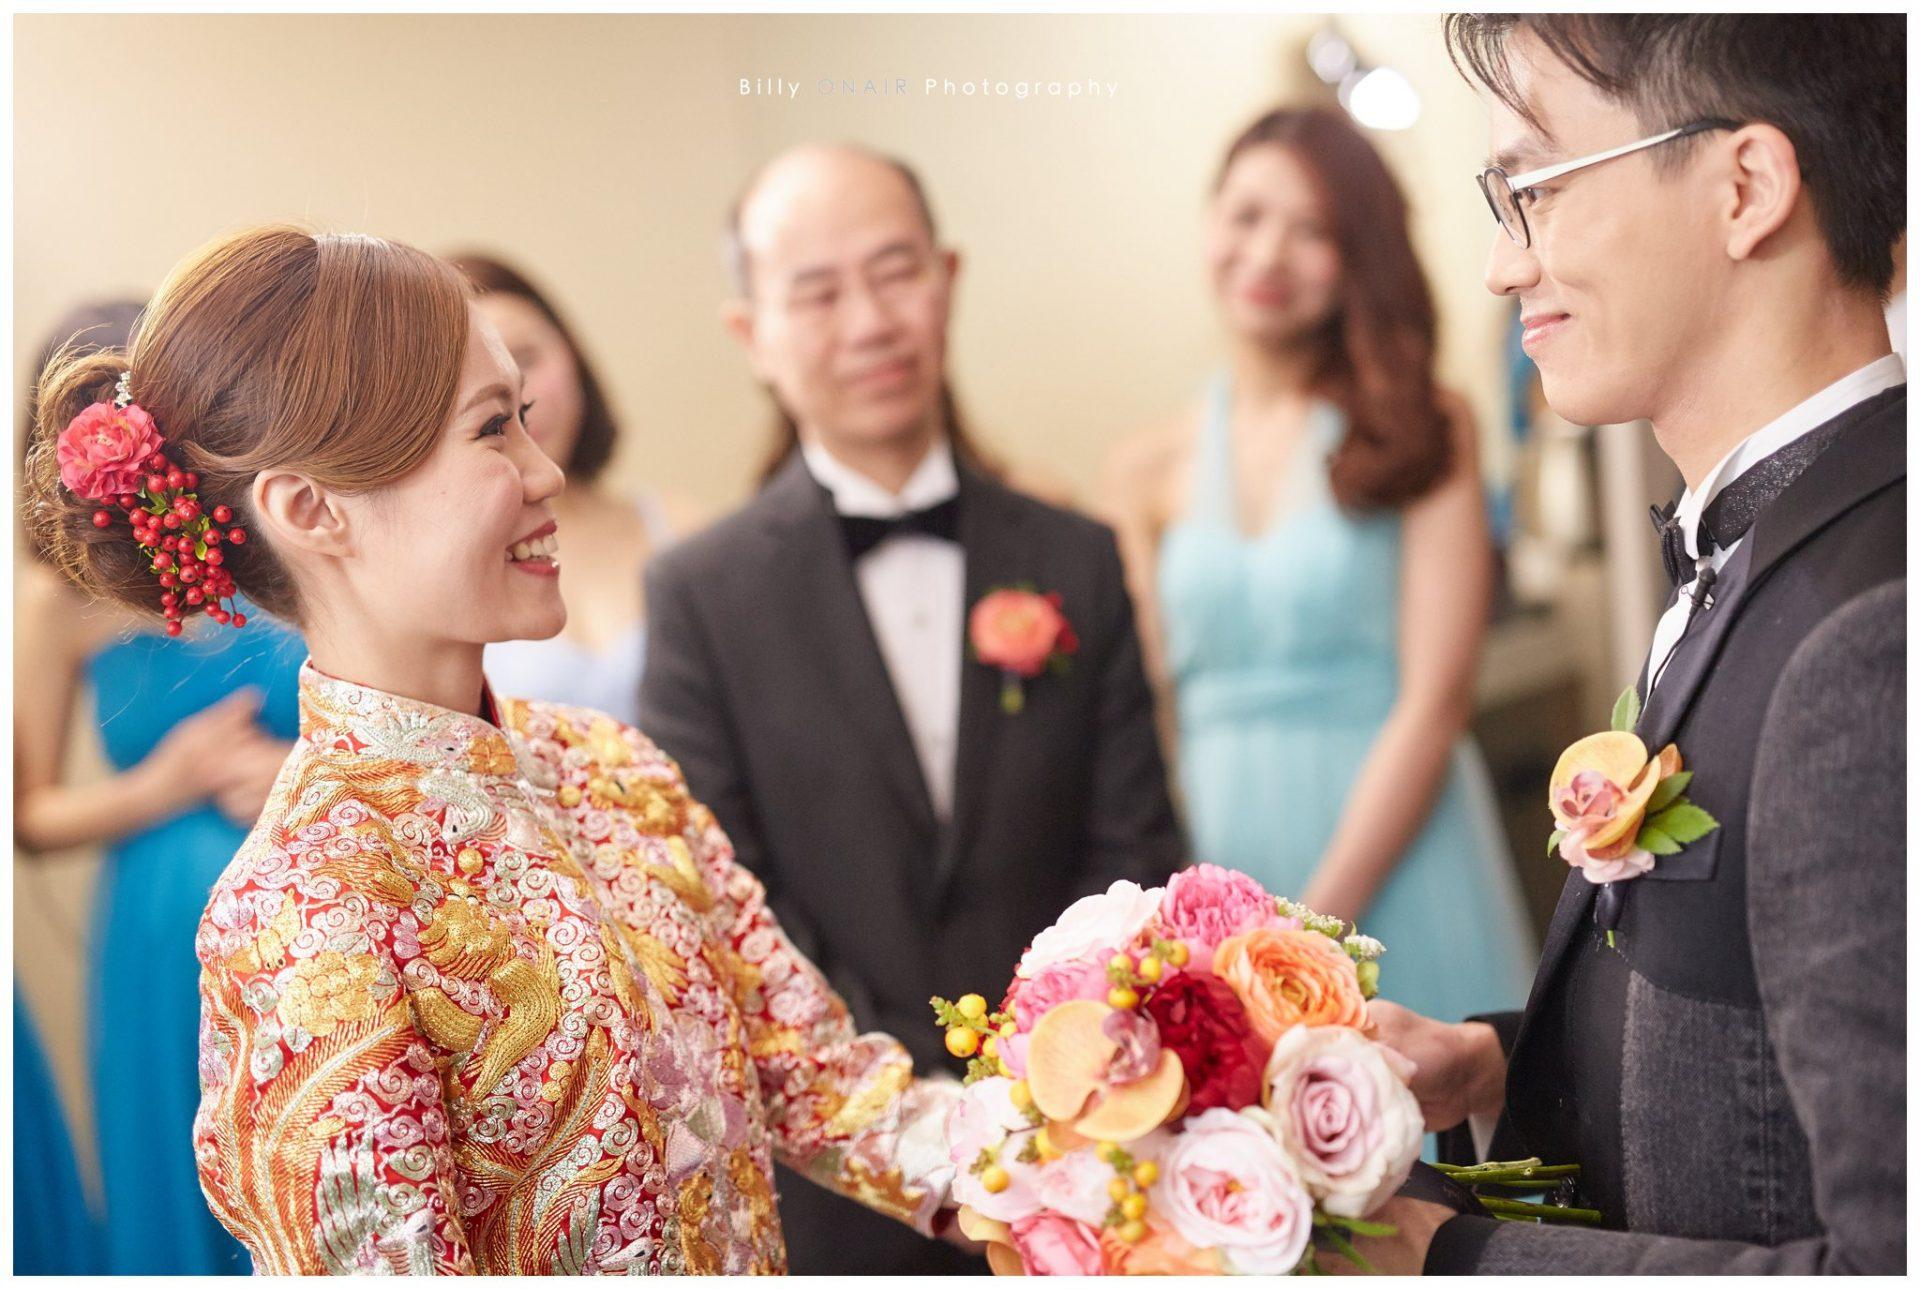 billy_wedding_photography_010